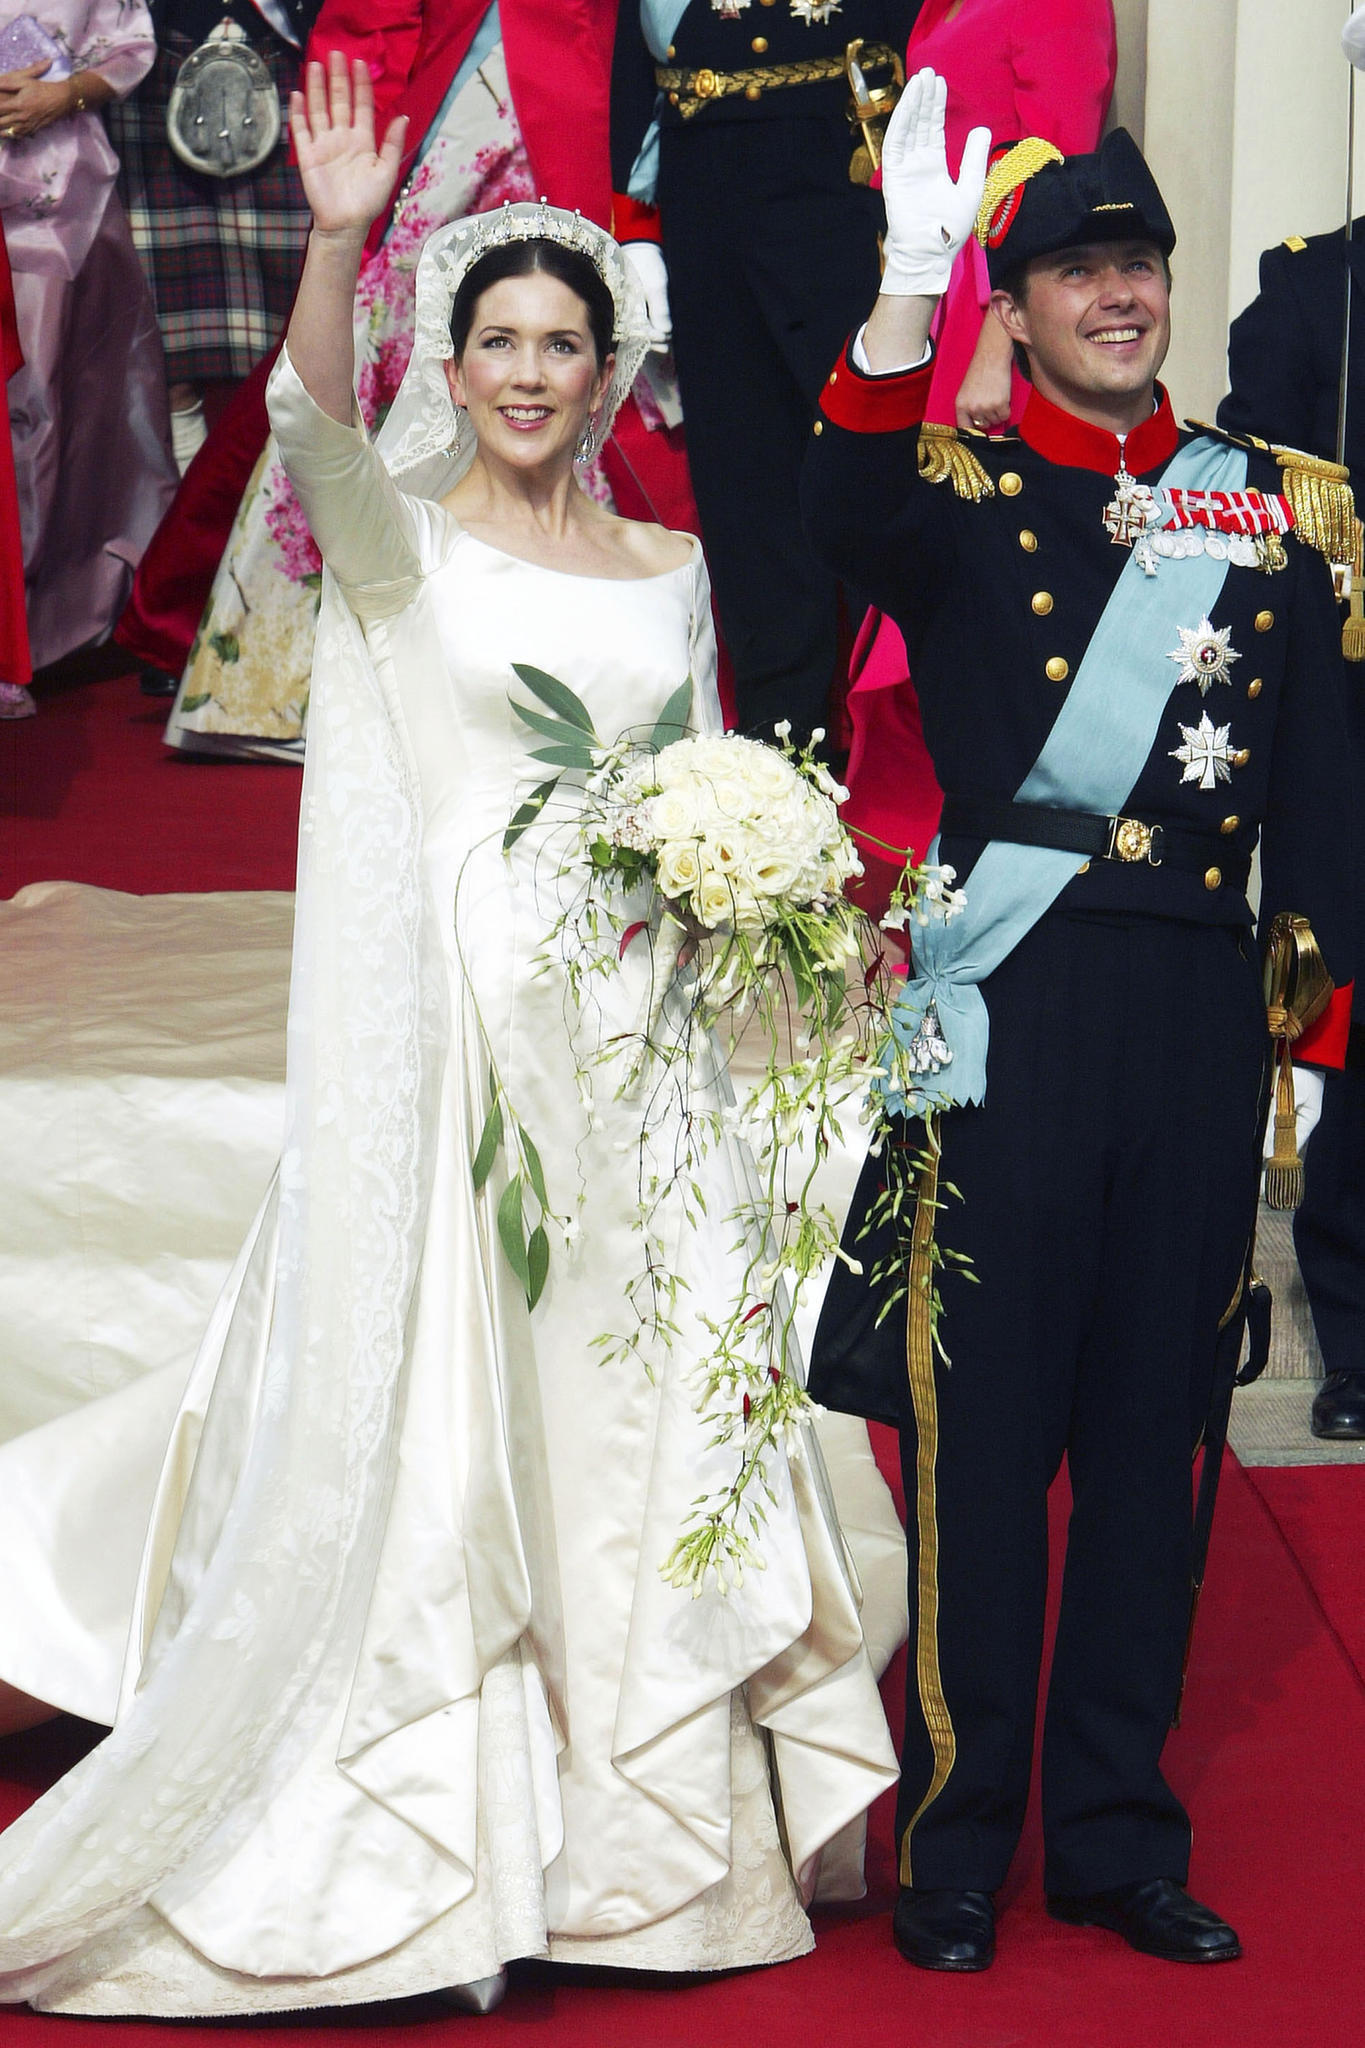 super popular sneakers in stock Brautmode: Royale Hochzeitskleider - S. 124 | GALA.de